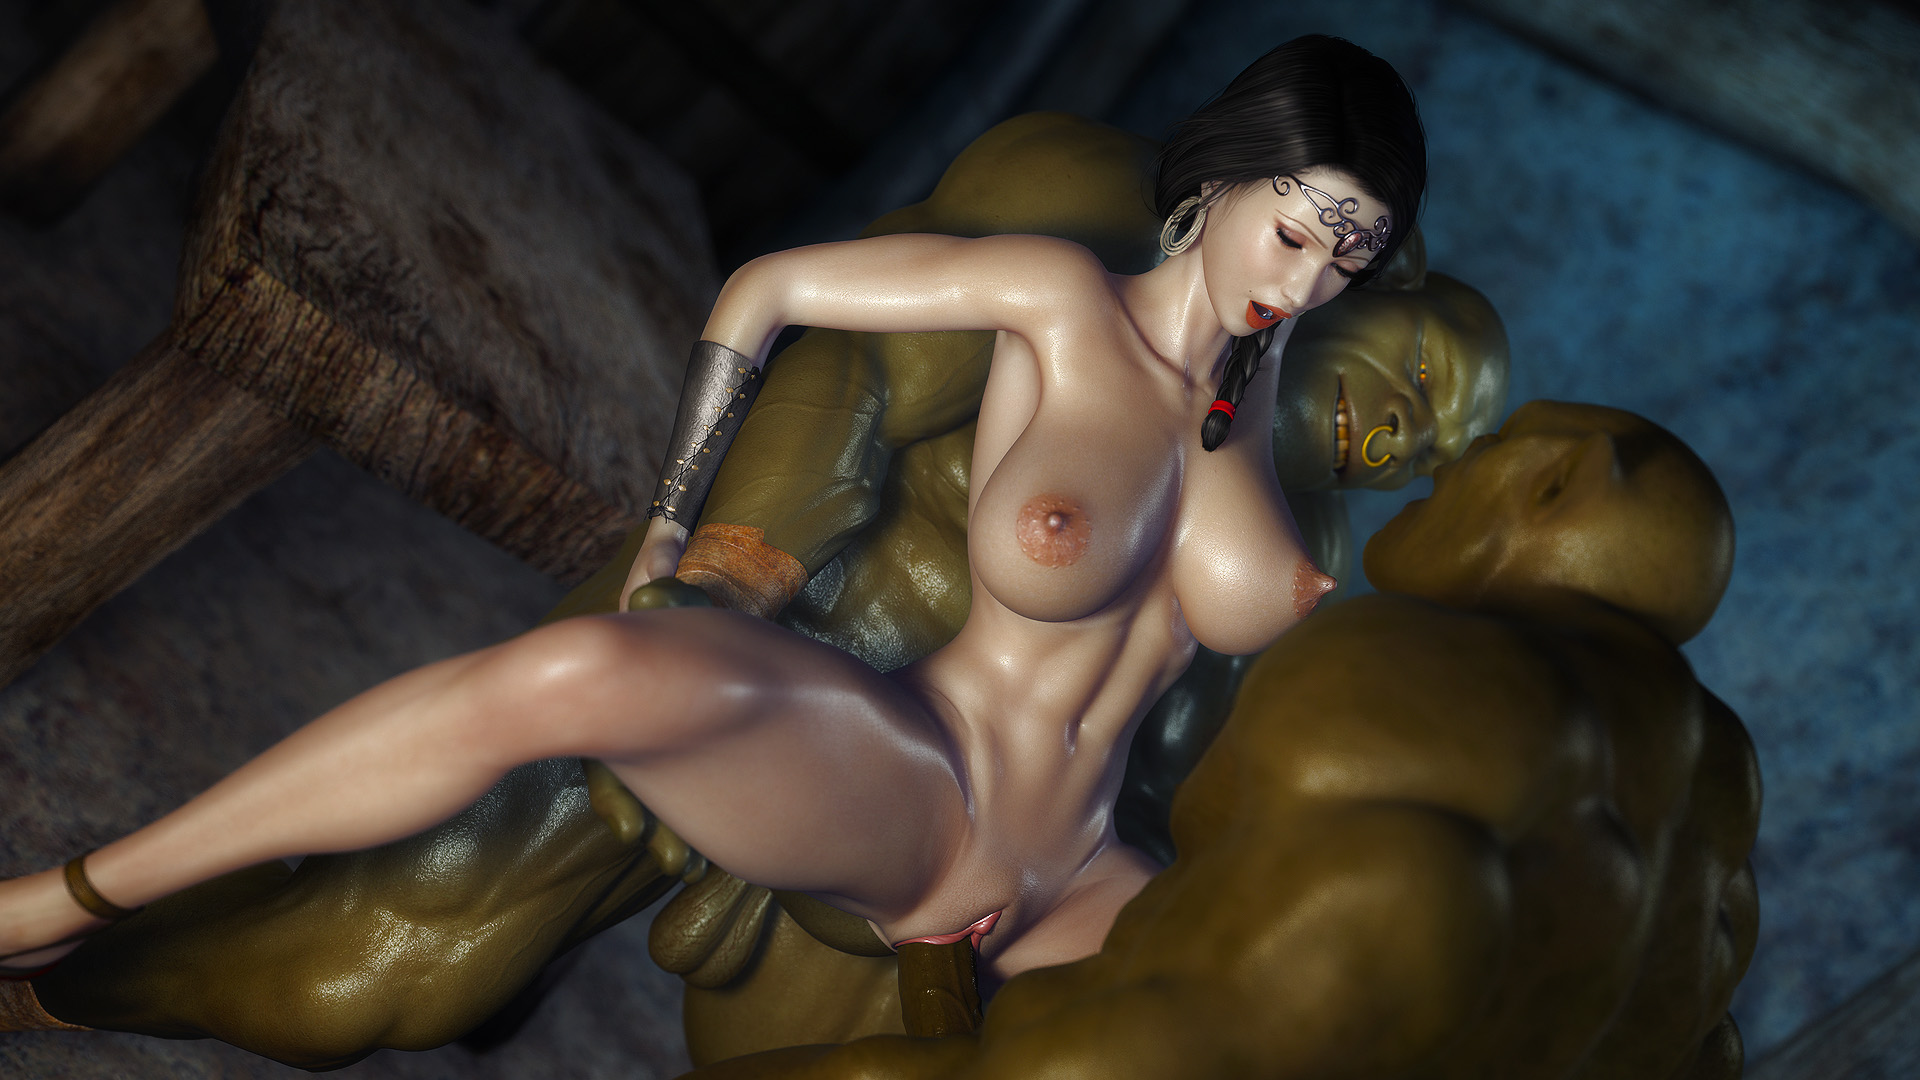 Хентай порно с орками 3 фотография